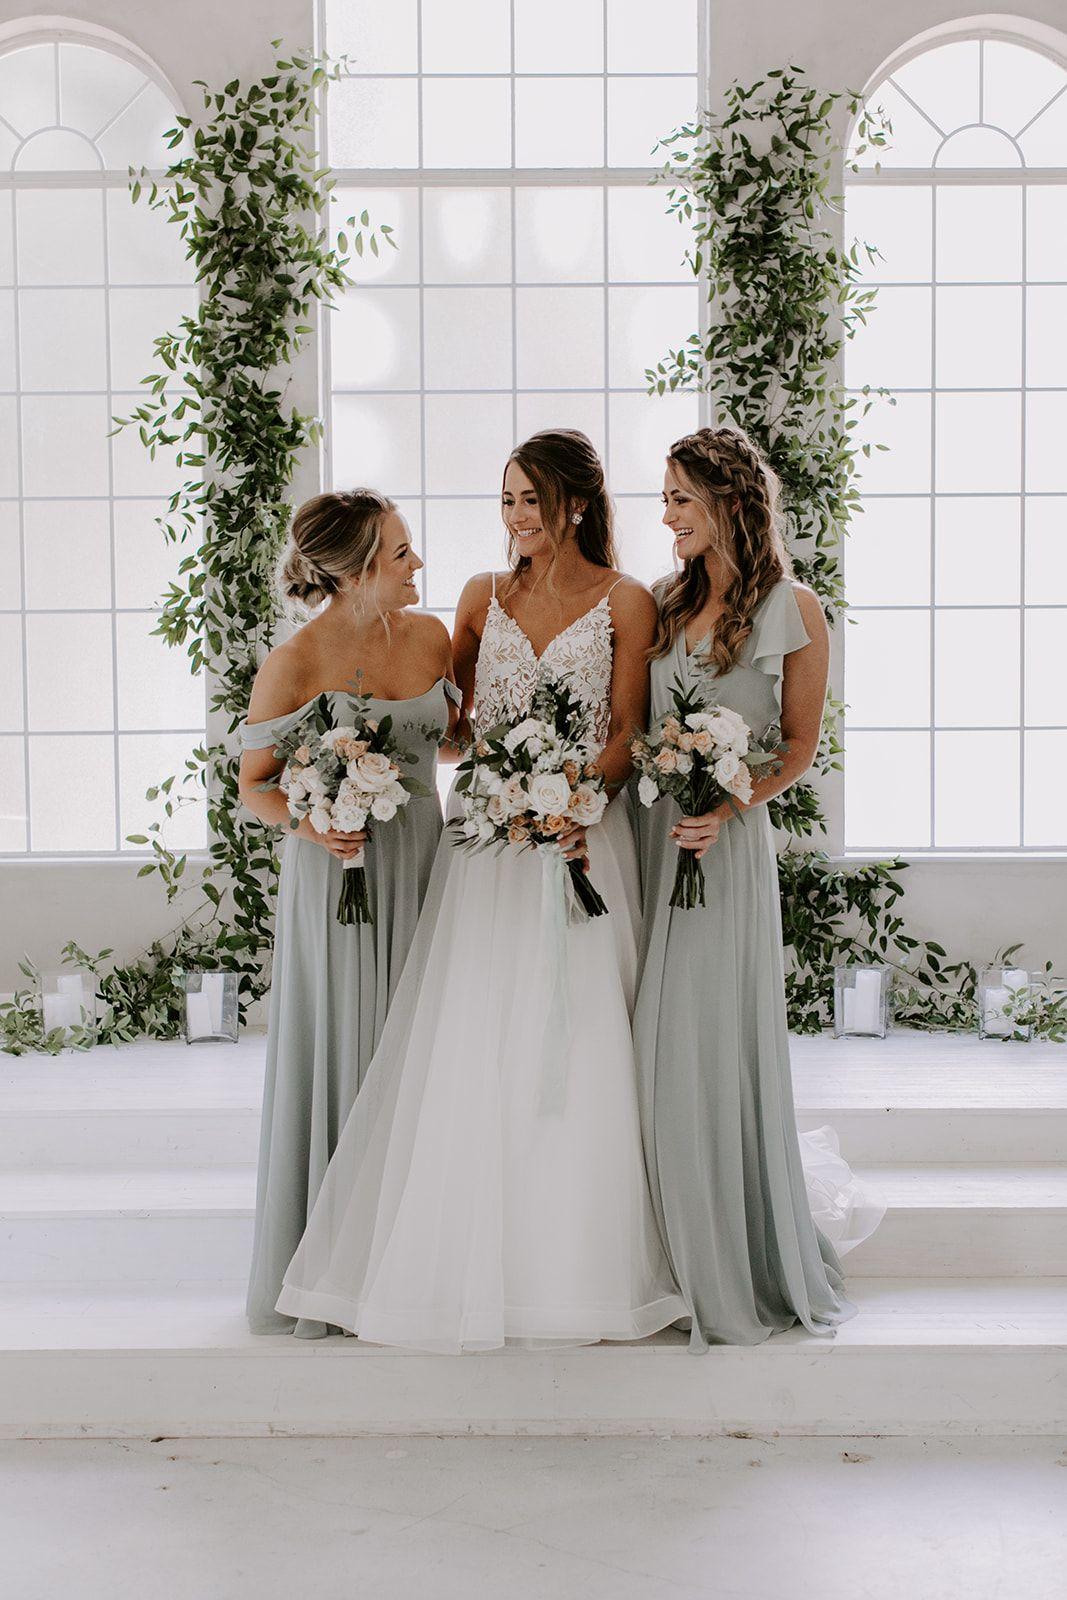 Minimal bridesmaid dresses at a new wedding chapel in